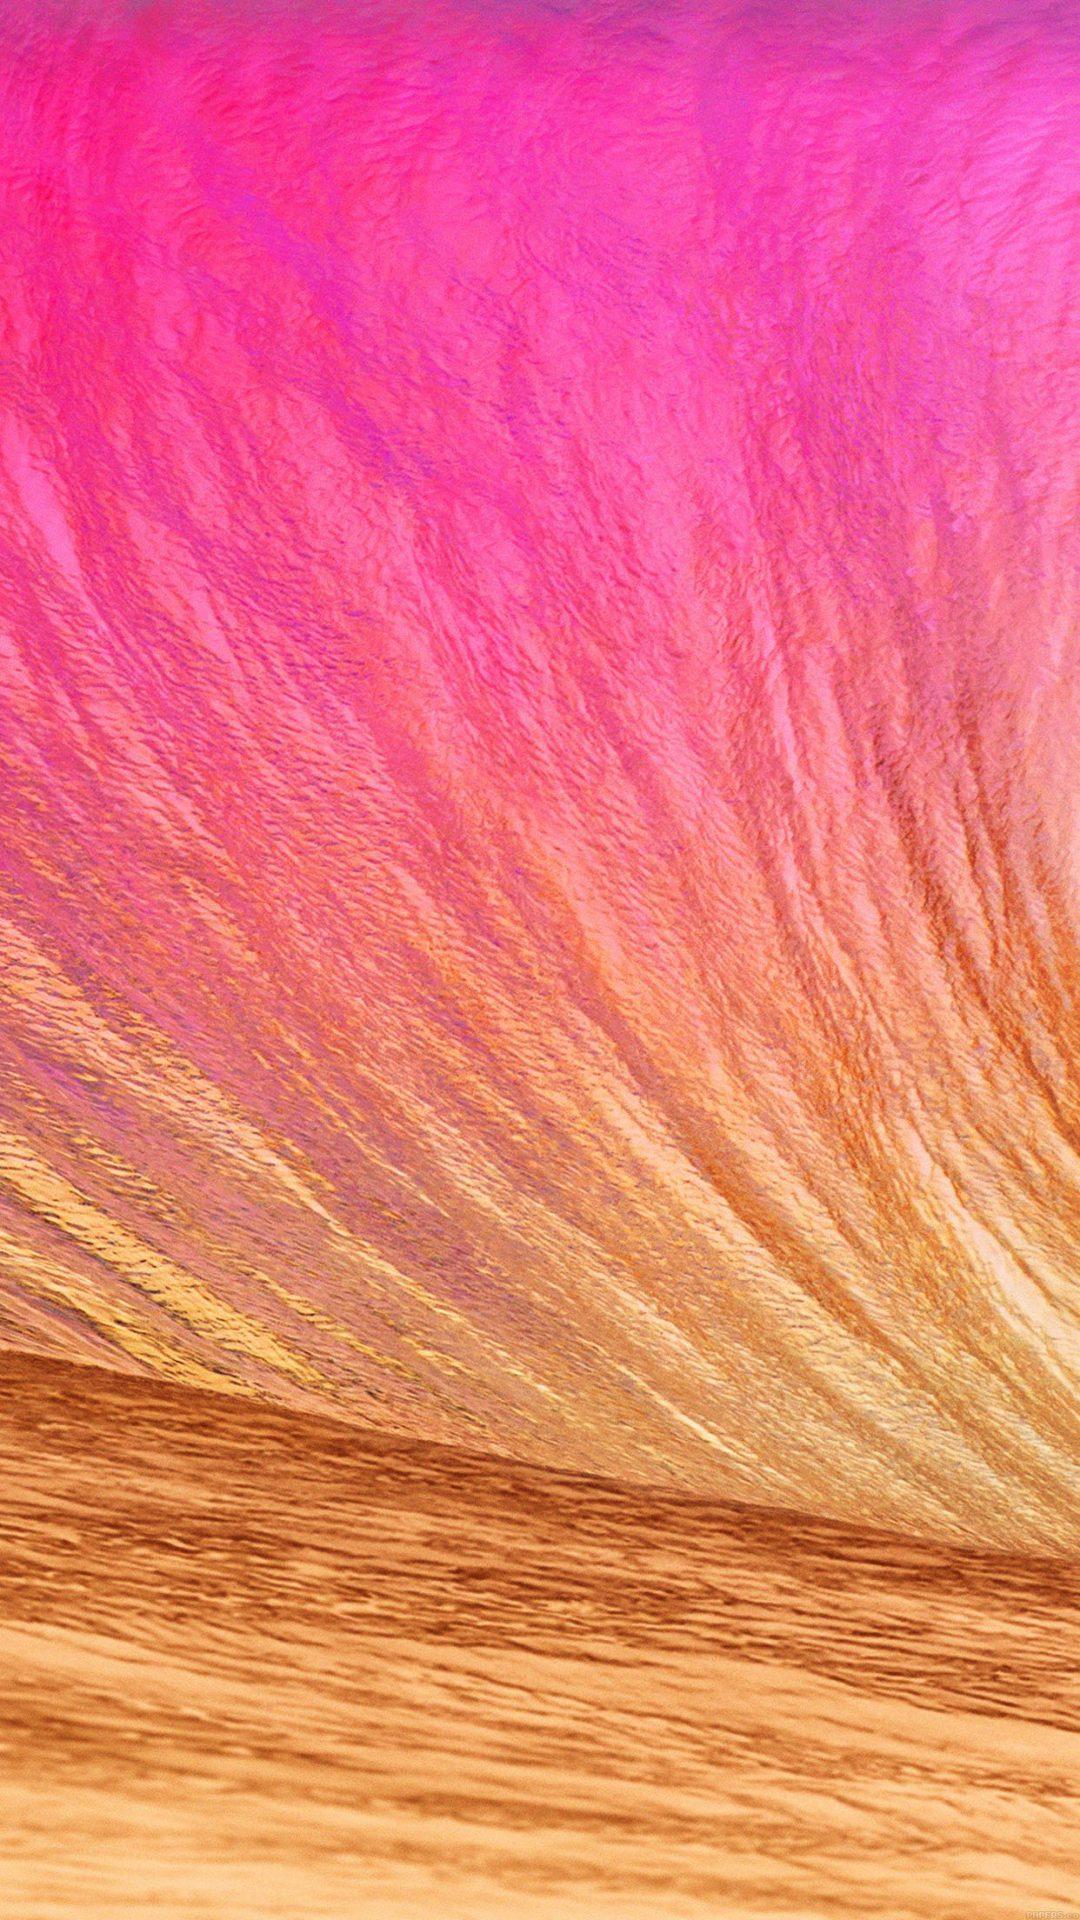 Wallpaper Gold Wave Apple Sea